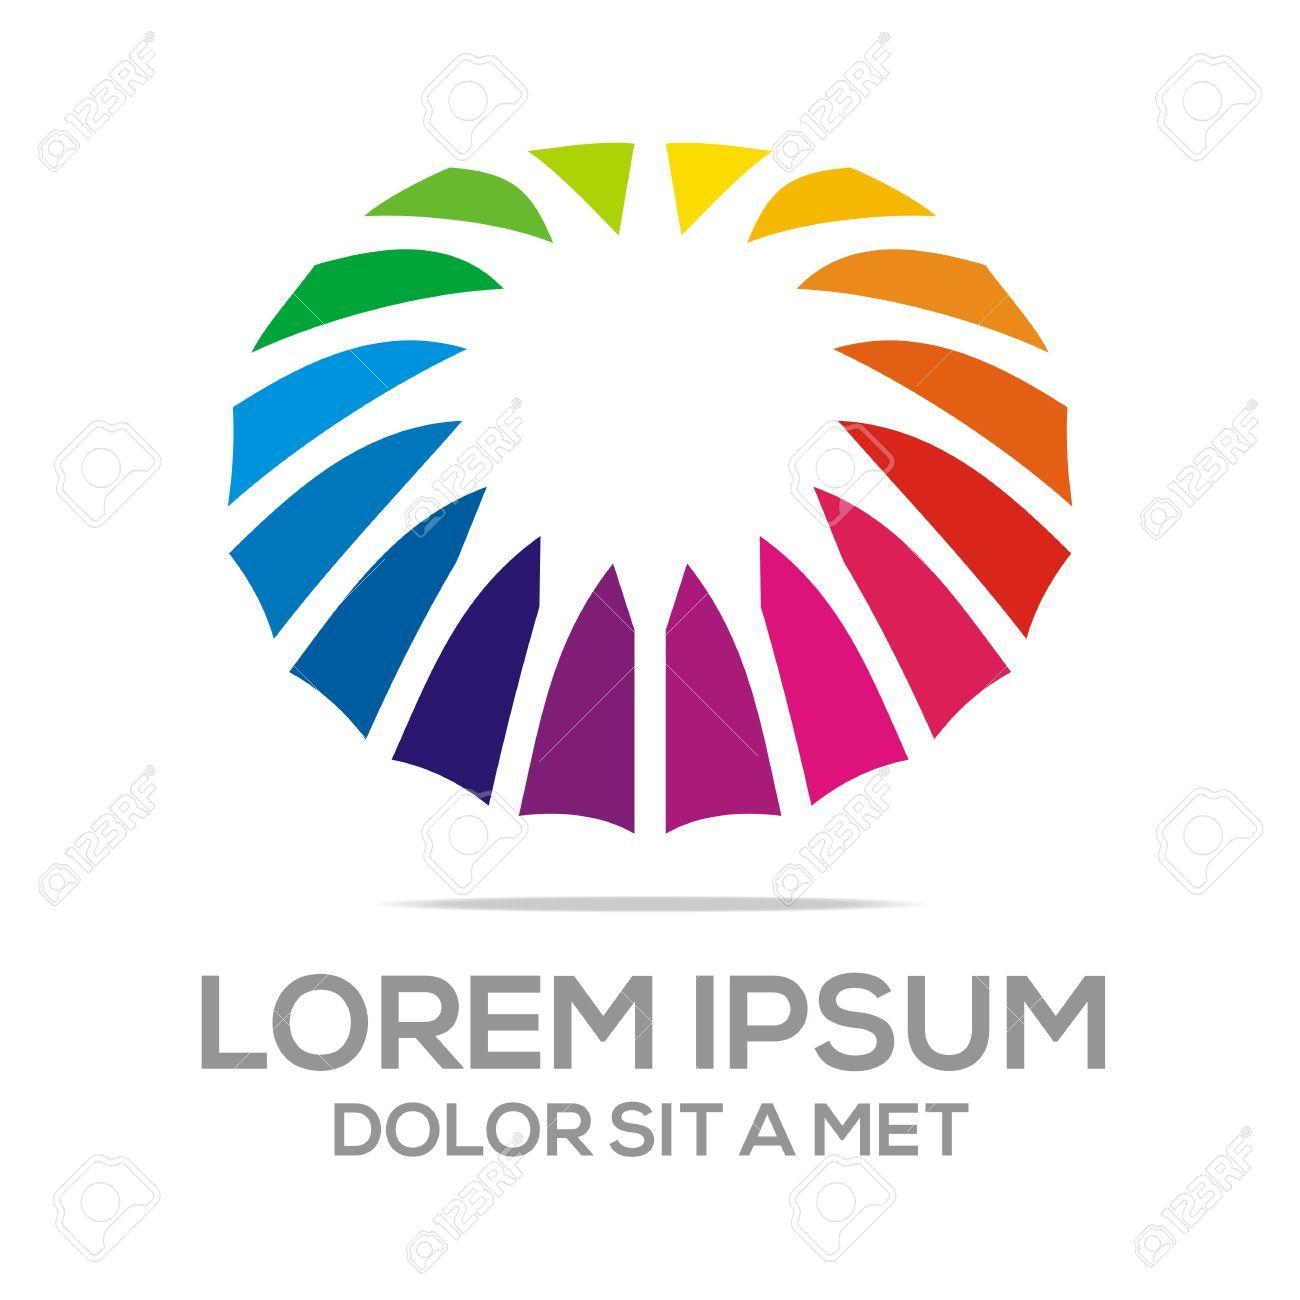 6fd676428762b Logo Umbrella Abstract Star Logo Rainbow Colorful Royalty Free .